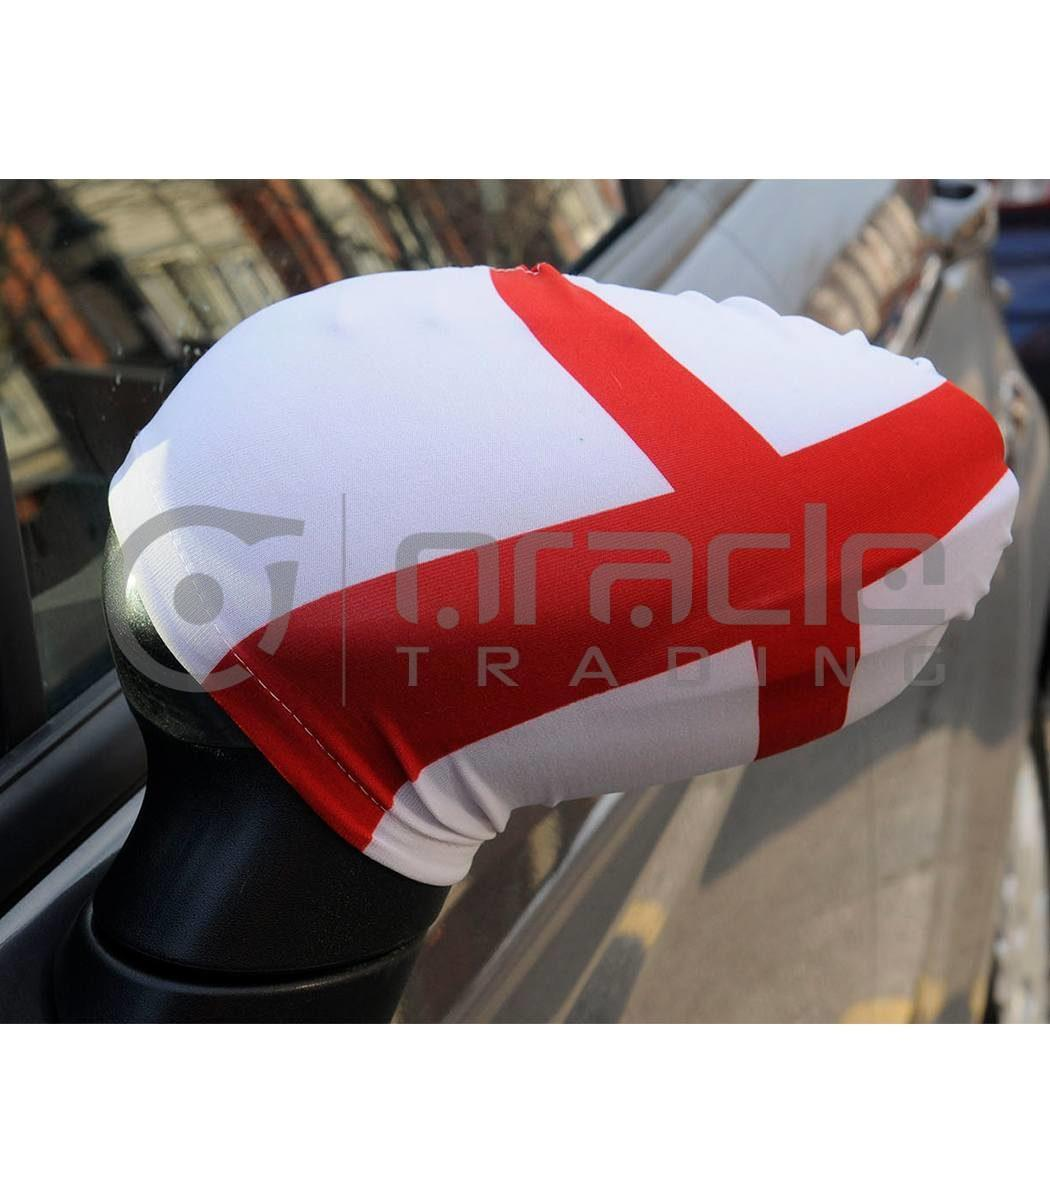 England Mirror Cover Set